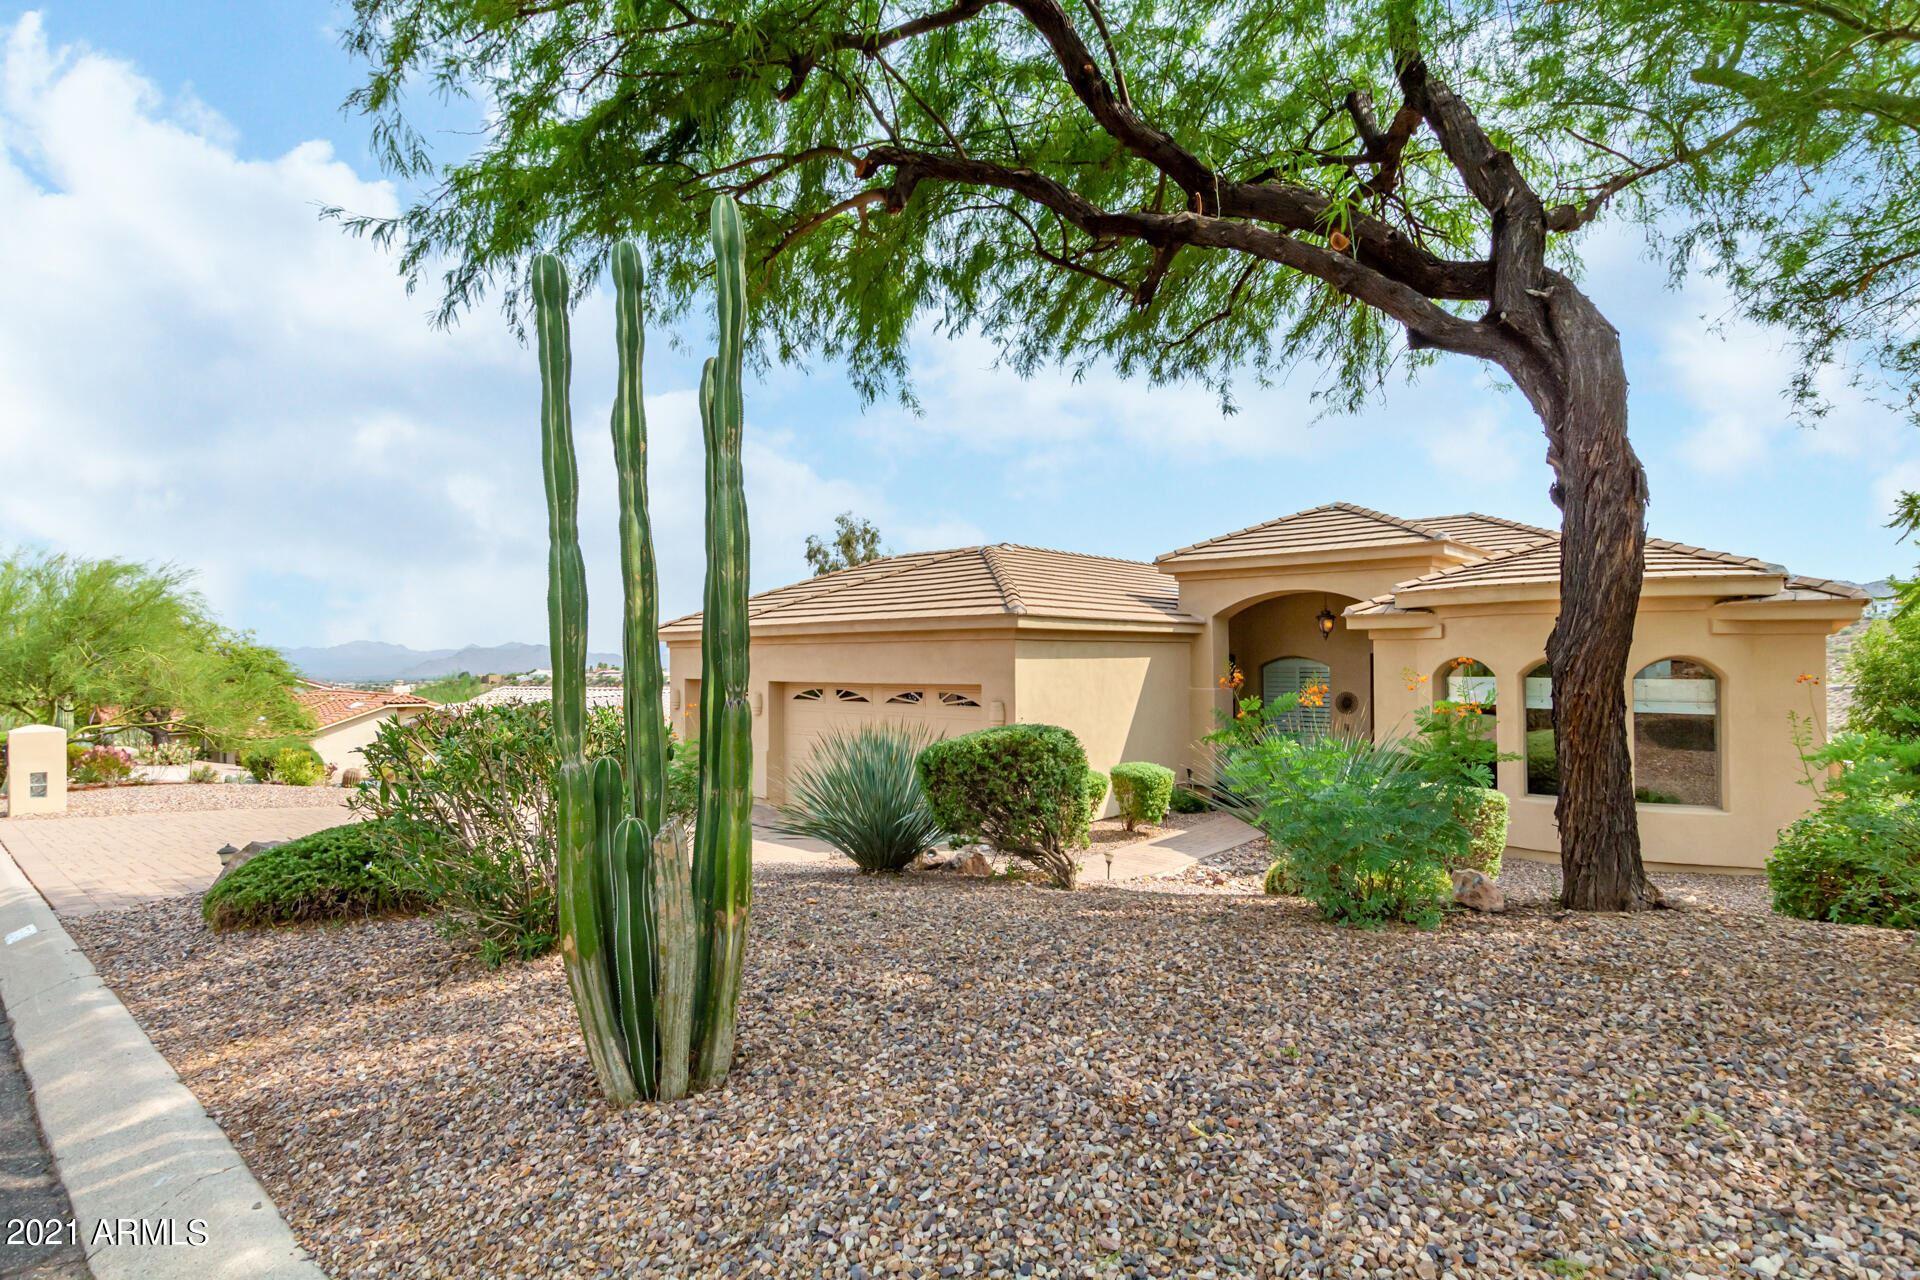 Photo of 15543 E SCORPION Drive, Fountain Hills, AZ 85268 (MLS # 6269119)